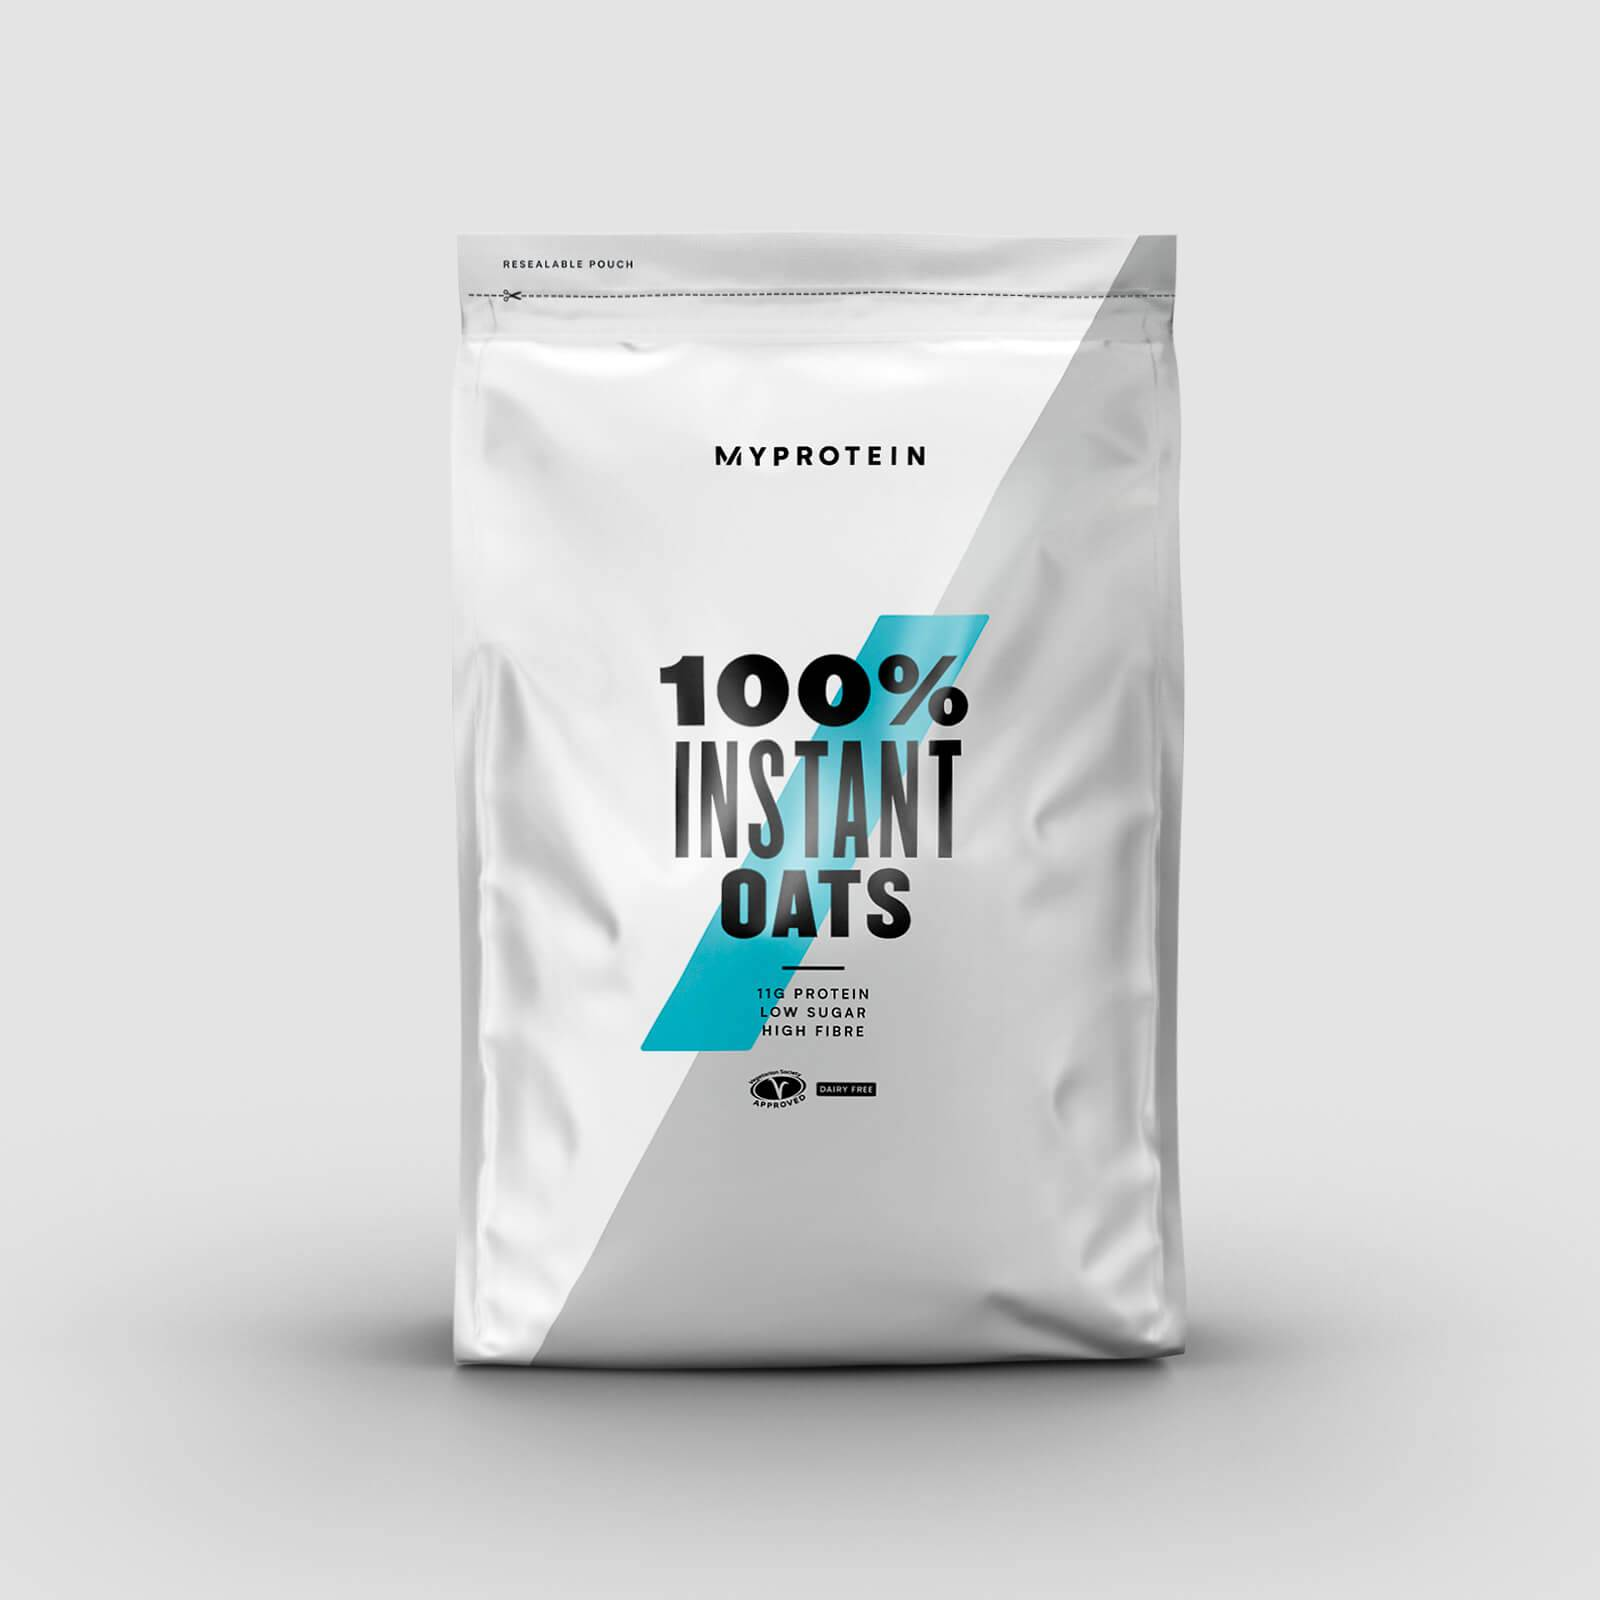 Myprotein Avoine instantanée en poudre - 1kg - Vanille